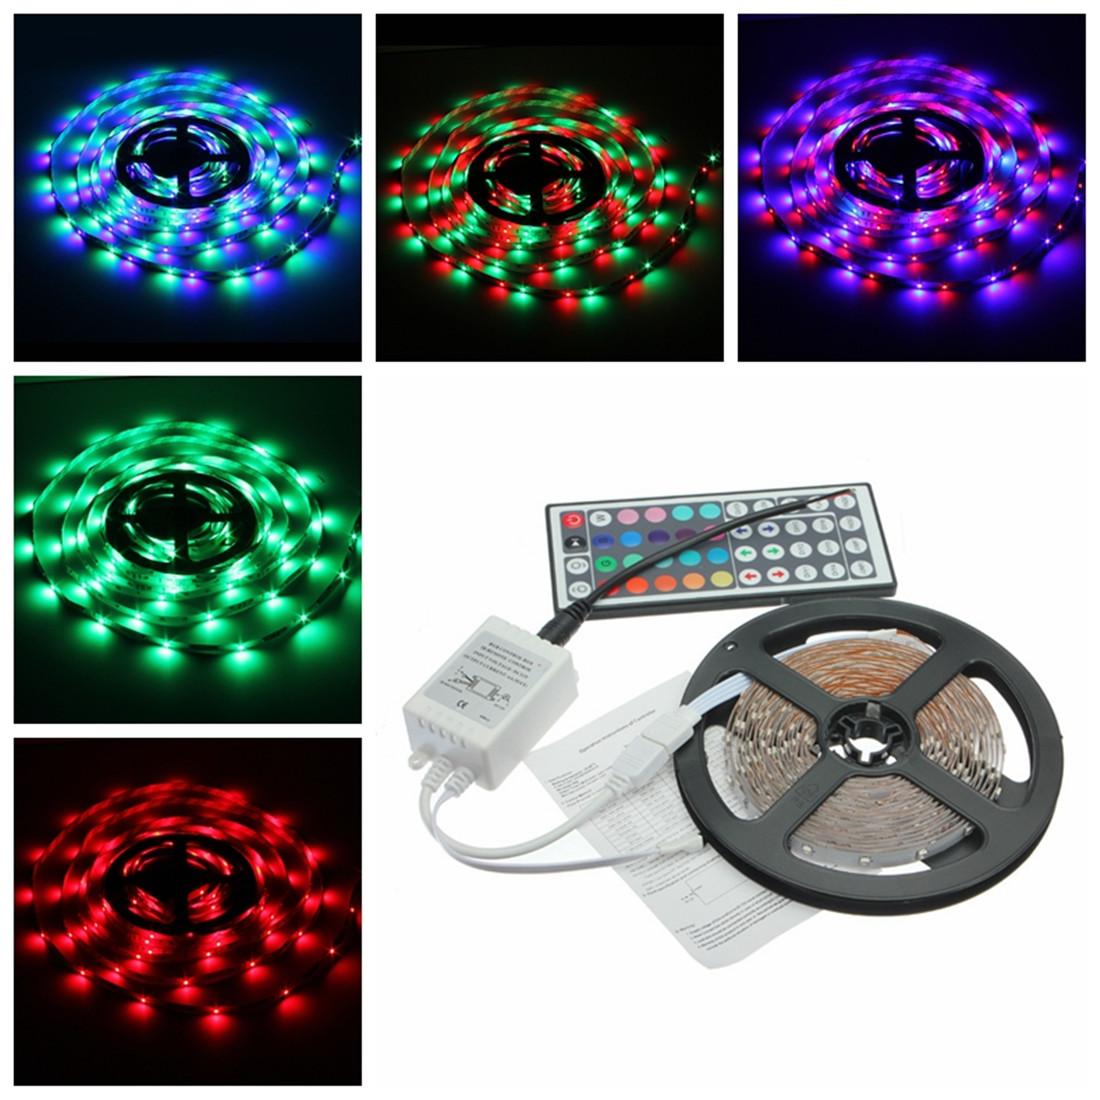 SMD RGB Flexible Strip Light   44 Key IR Remote Controller 12V eBay #0EBD76